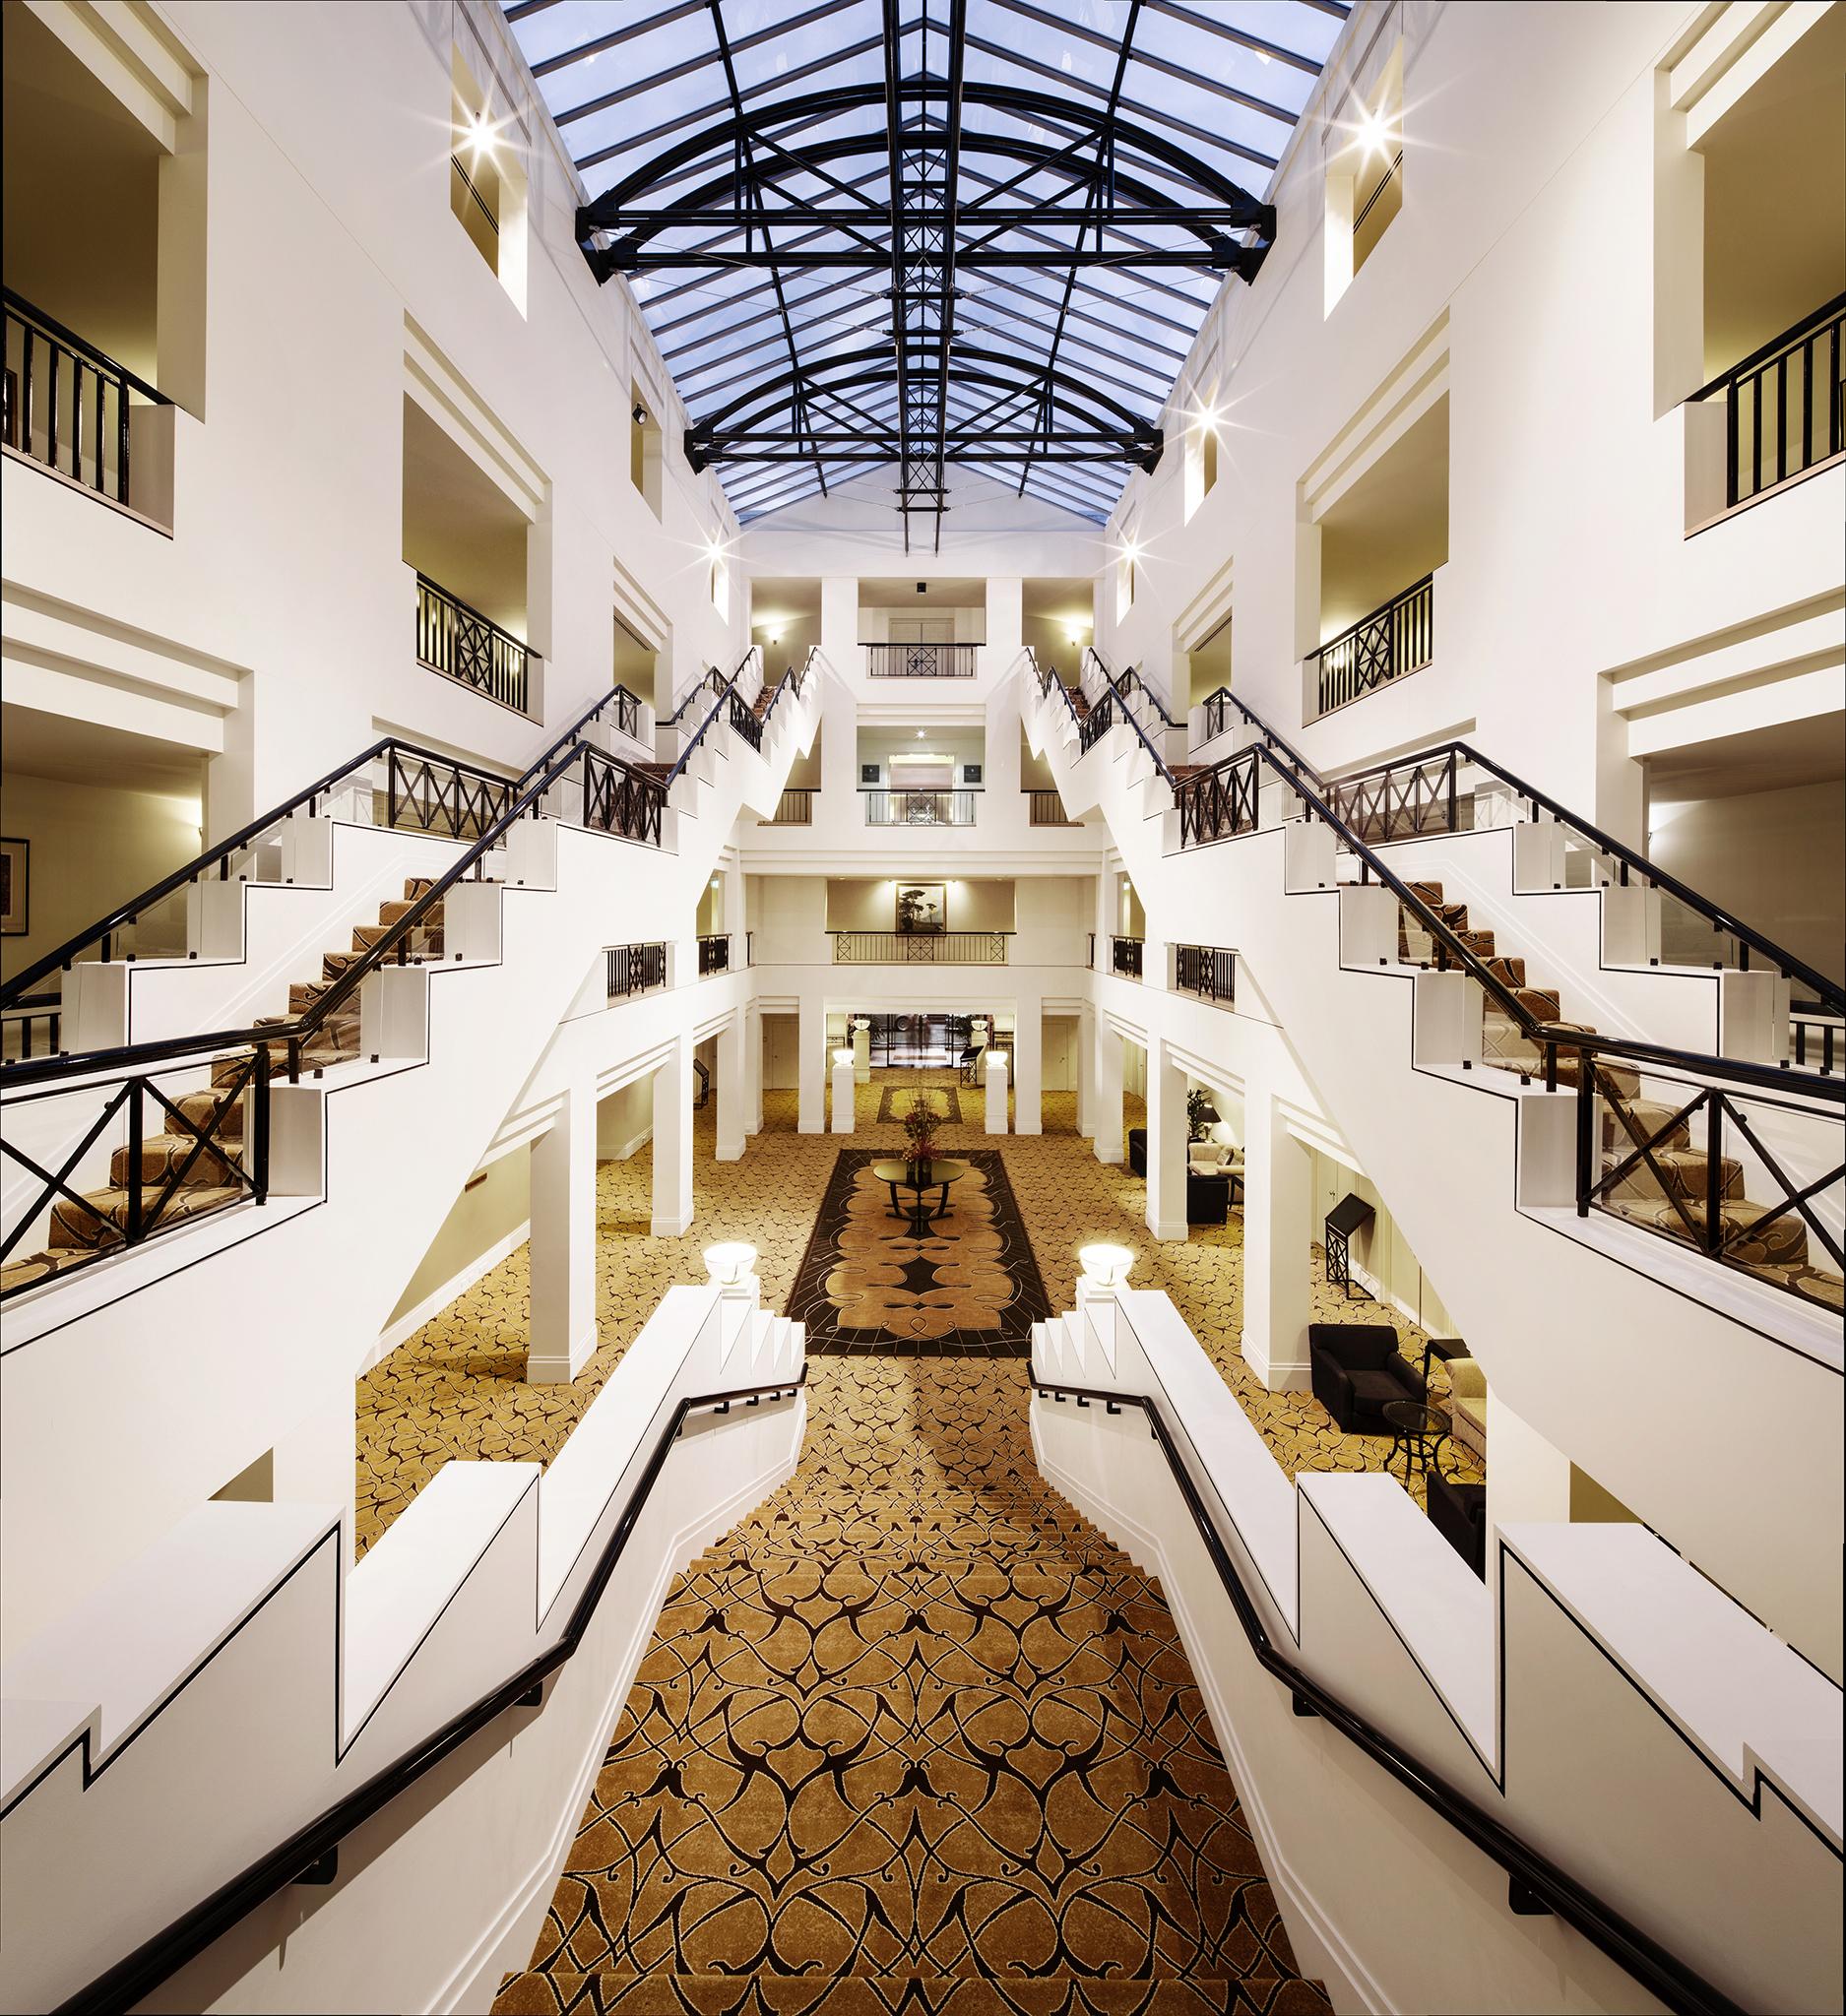 Staircase at Hyatt Hotel Canberra